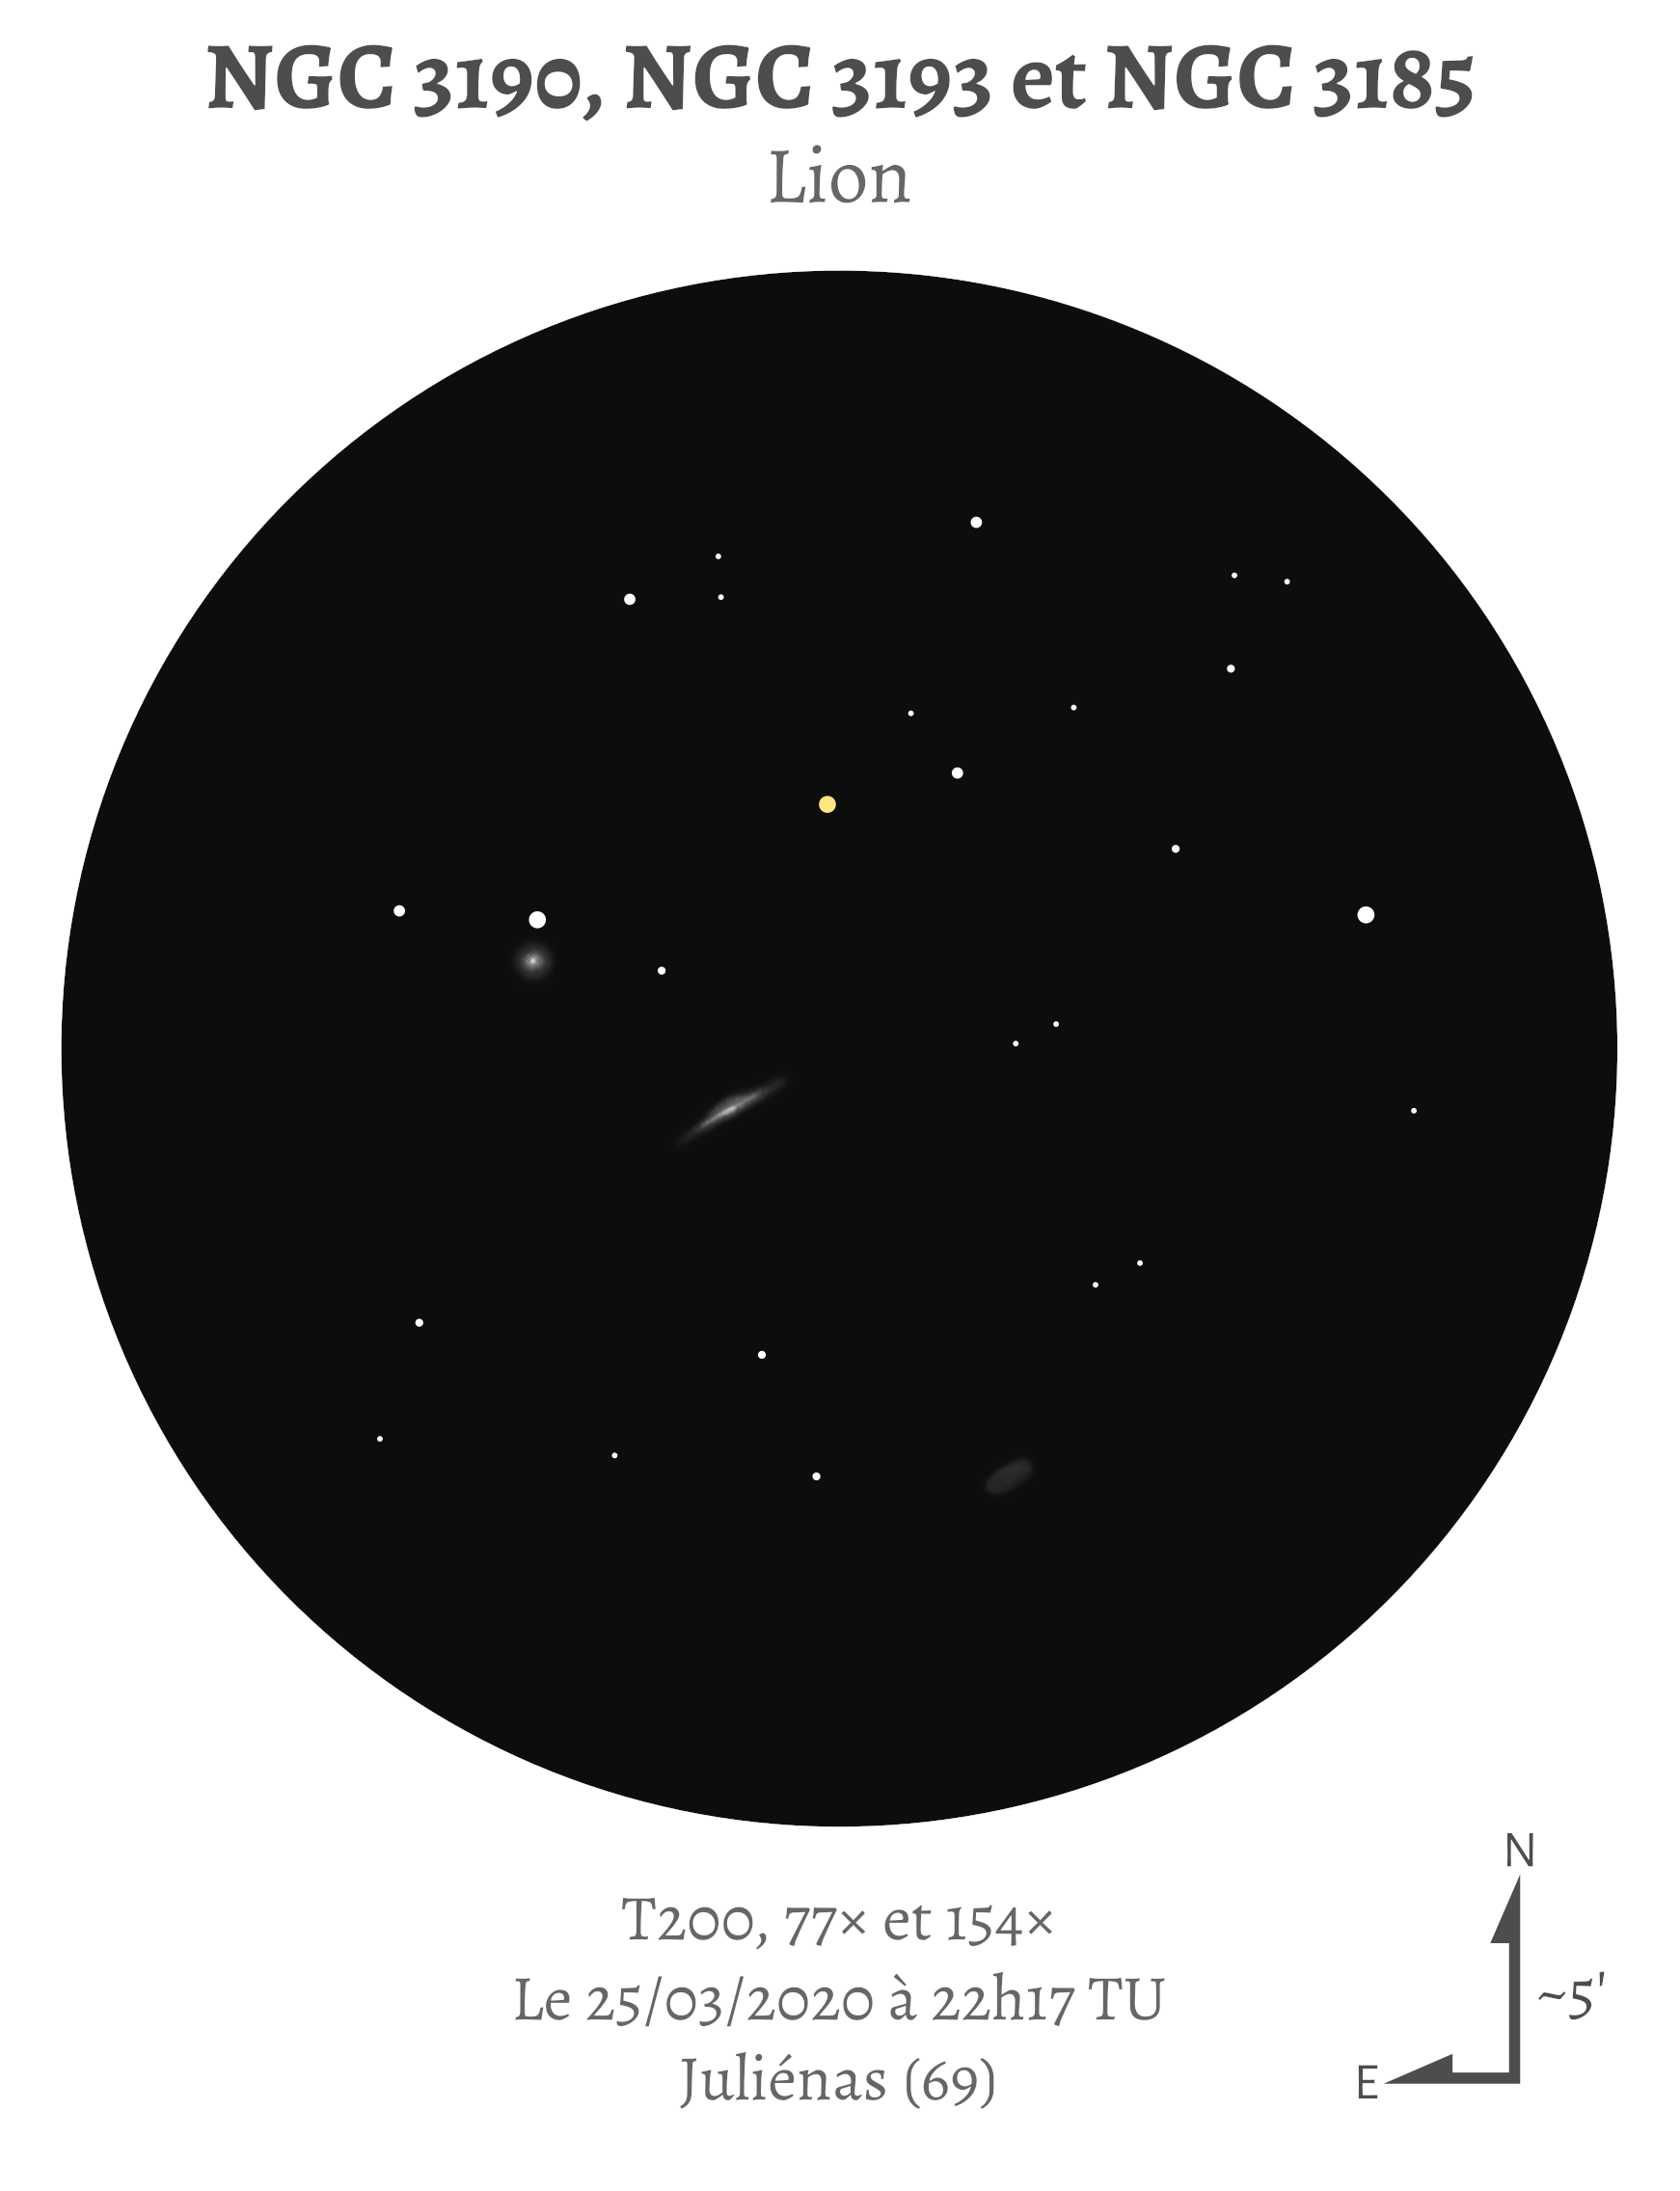 large.5e87355715d24_NGC319031933185-T200.png.517221dfc90f608bff8b3122ea3aebc3.png